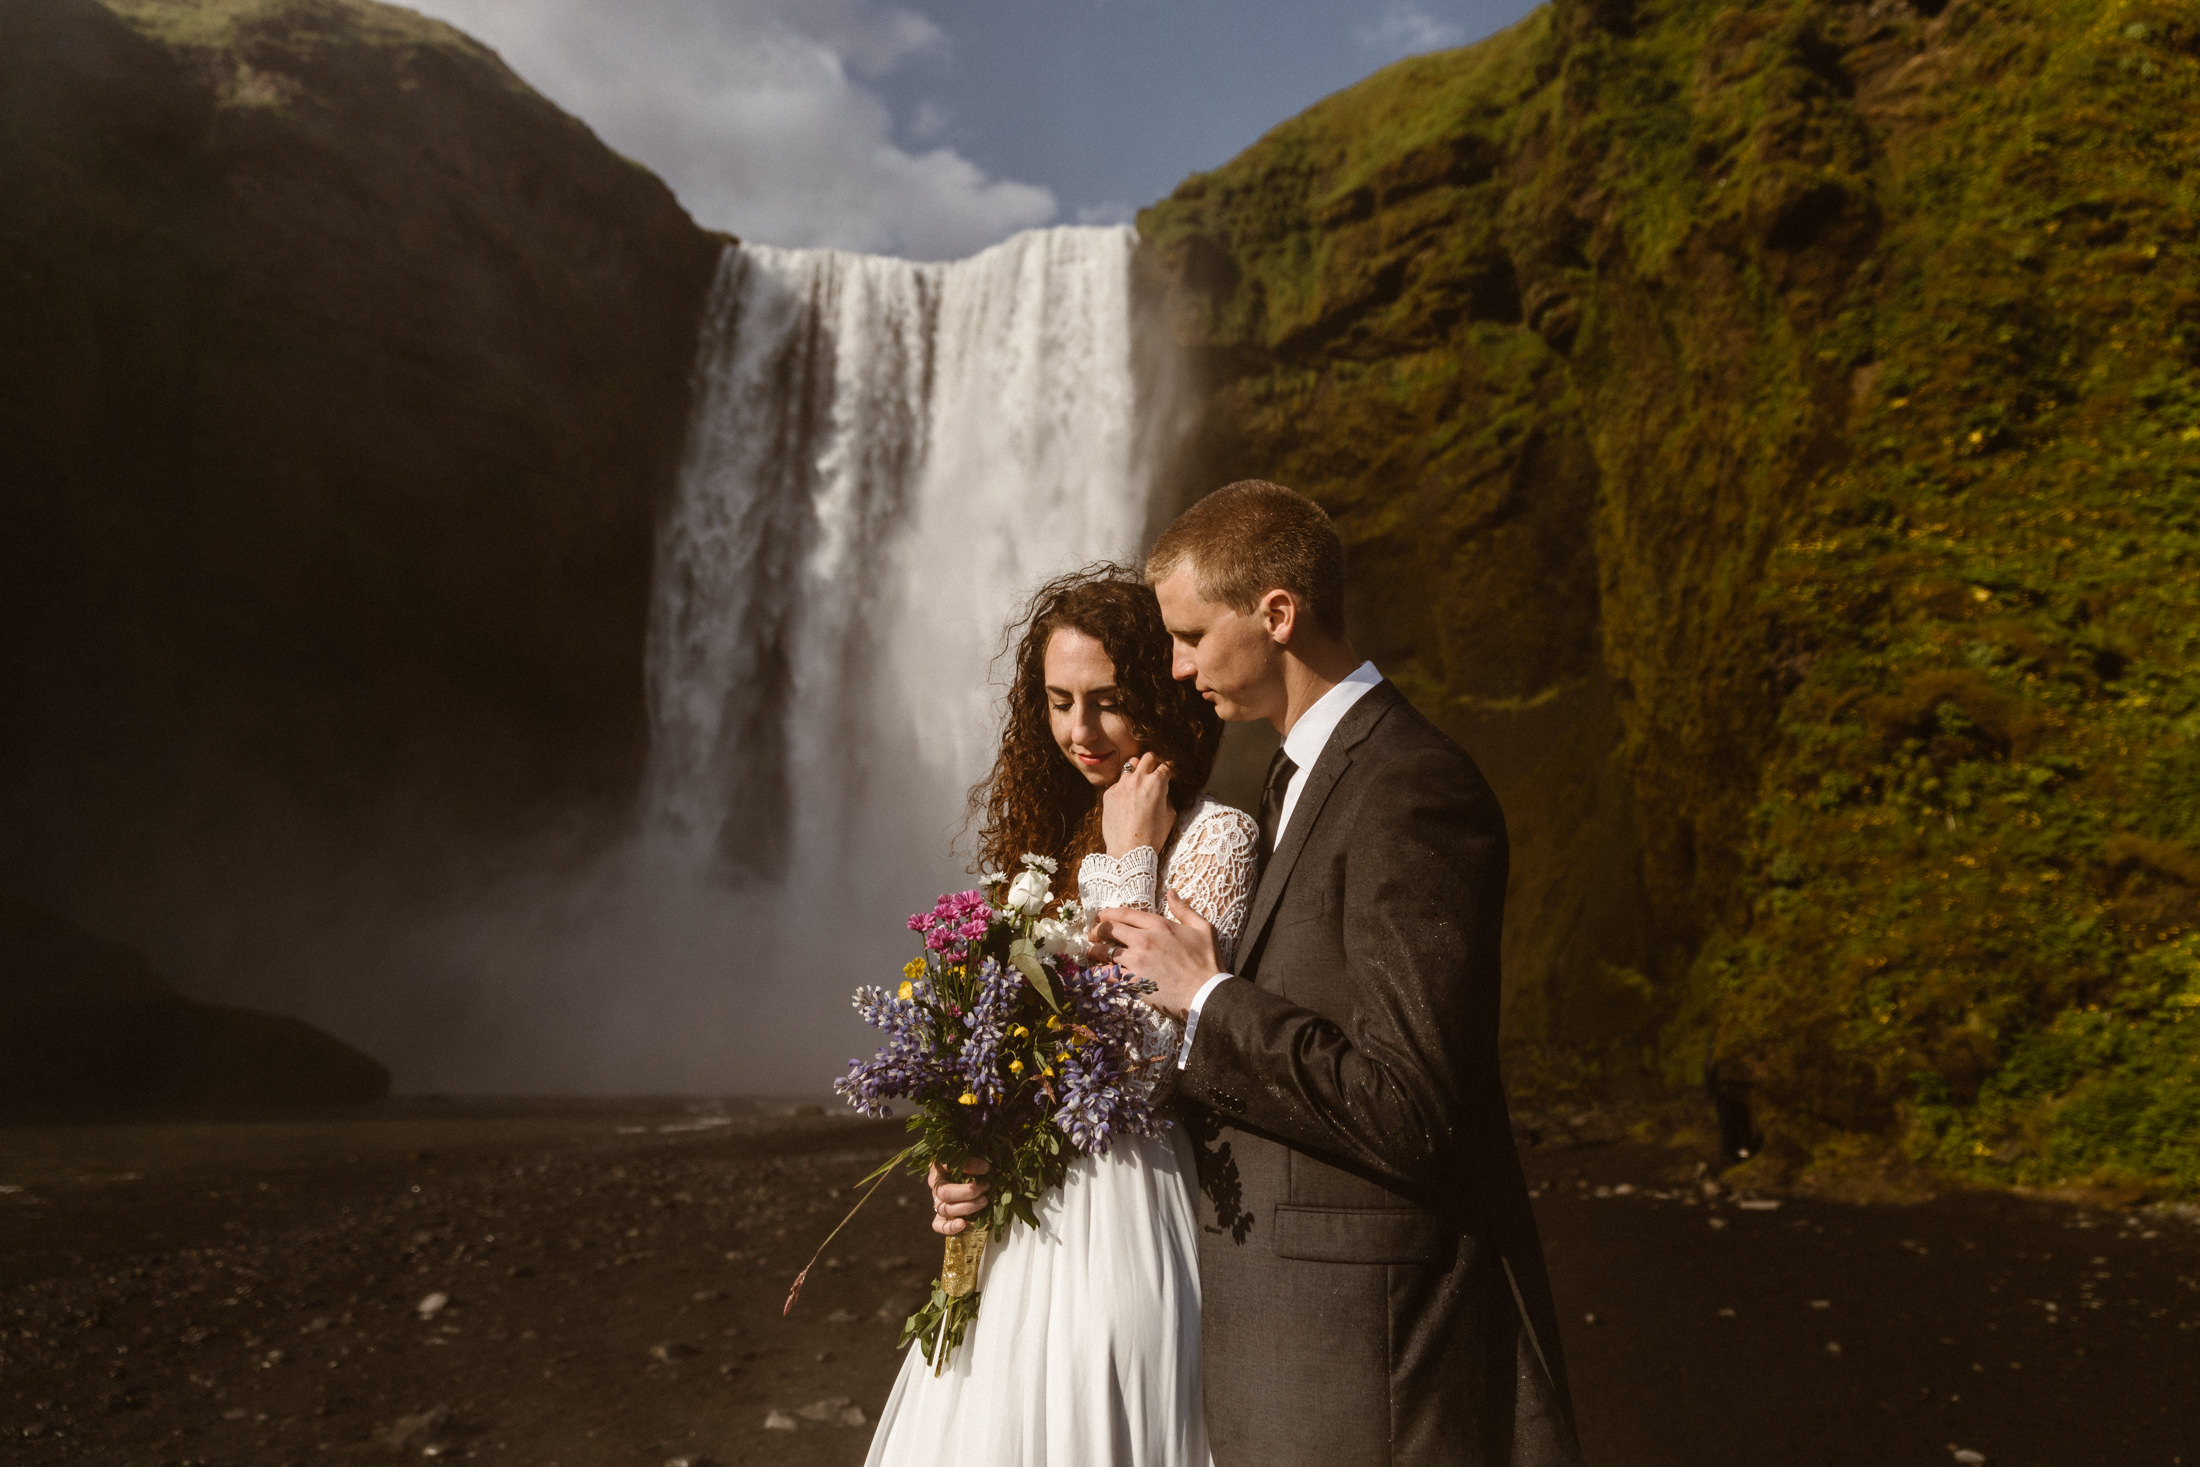 moody-elopement-photos-at-skogafoss-waterfall-in-iceland-narrowleaf-photography-4970.JPG